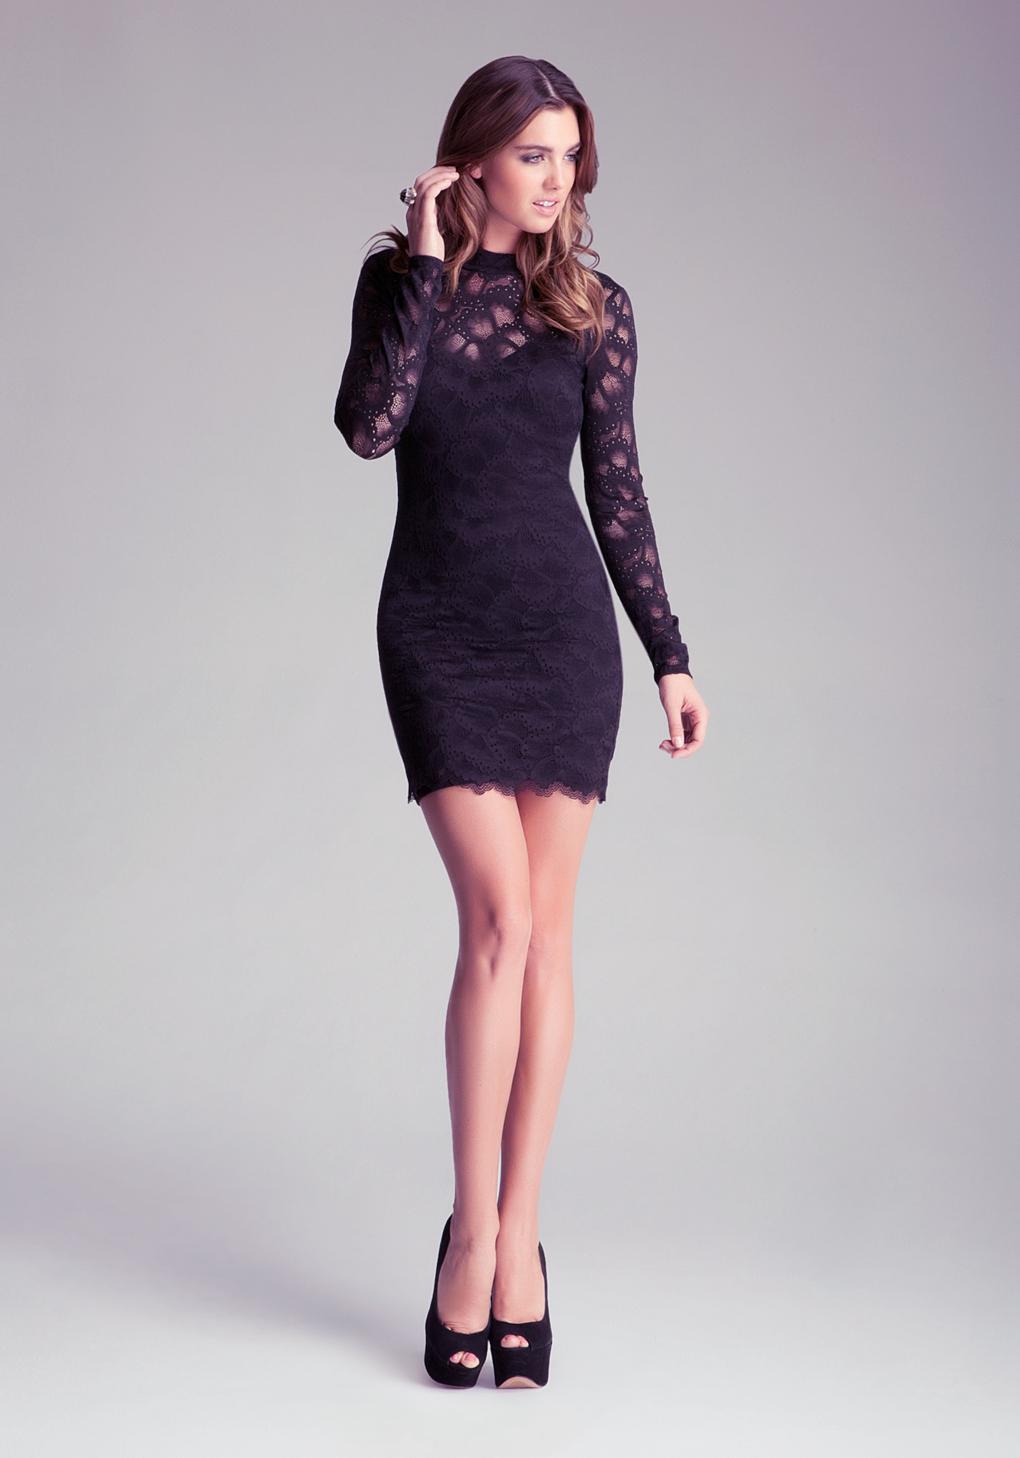 Black dress bebe - Gallery Women S Black Lace Cocktail Dresses